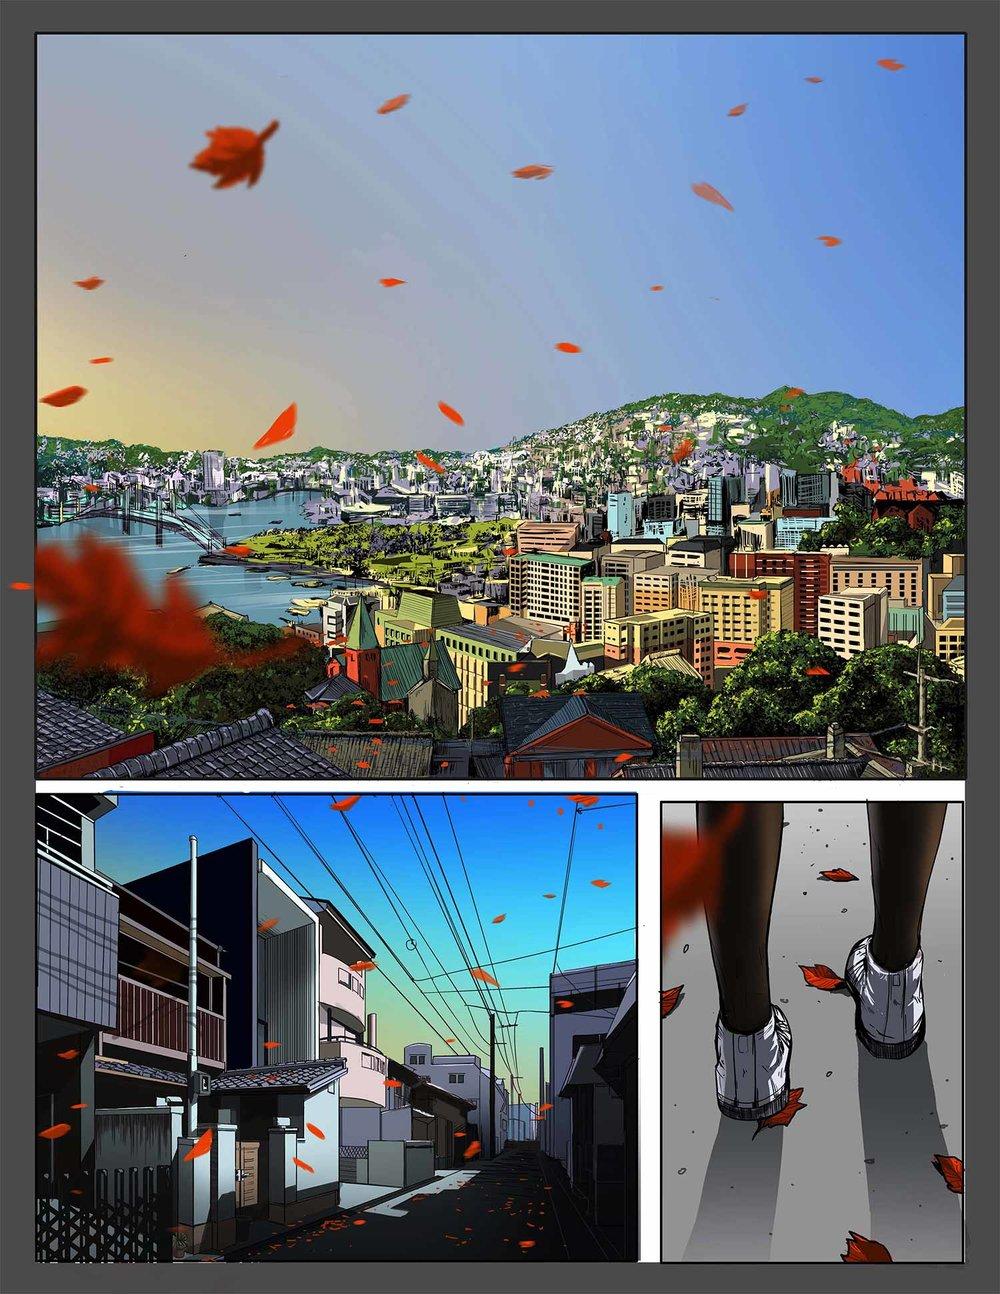 ashcan-digital-course-summer-manga-comics-works-03-2019-03.jpg